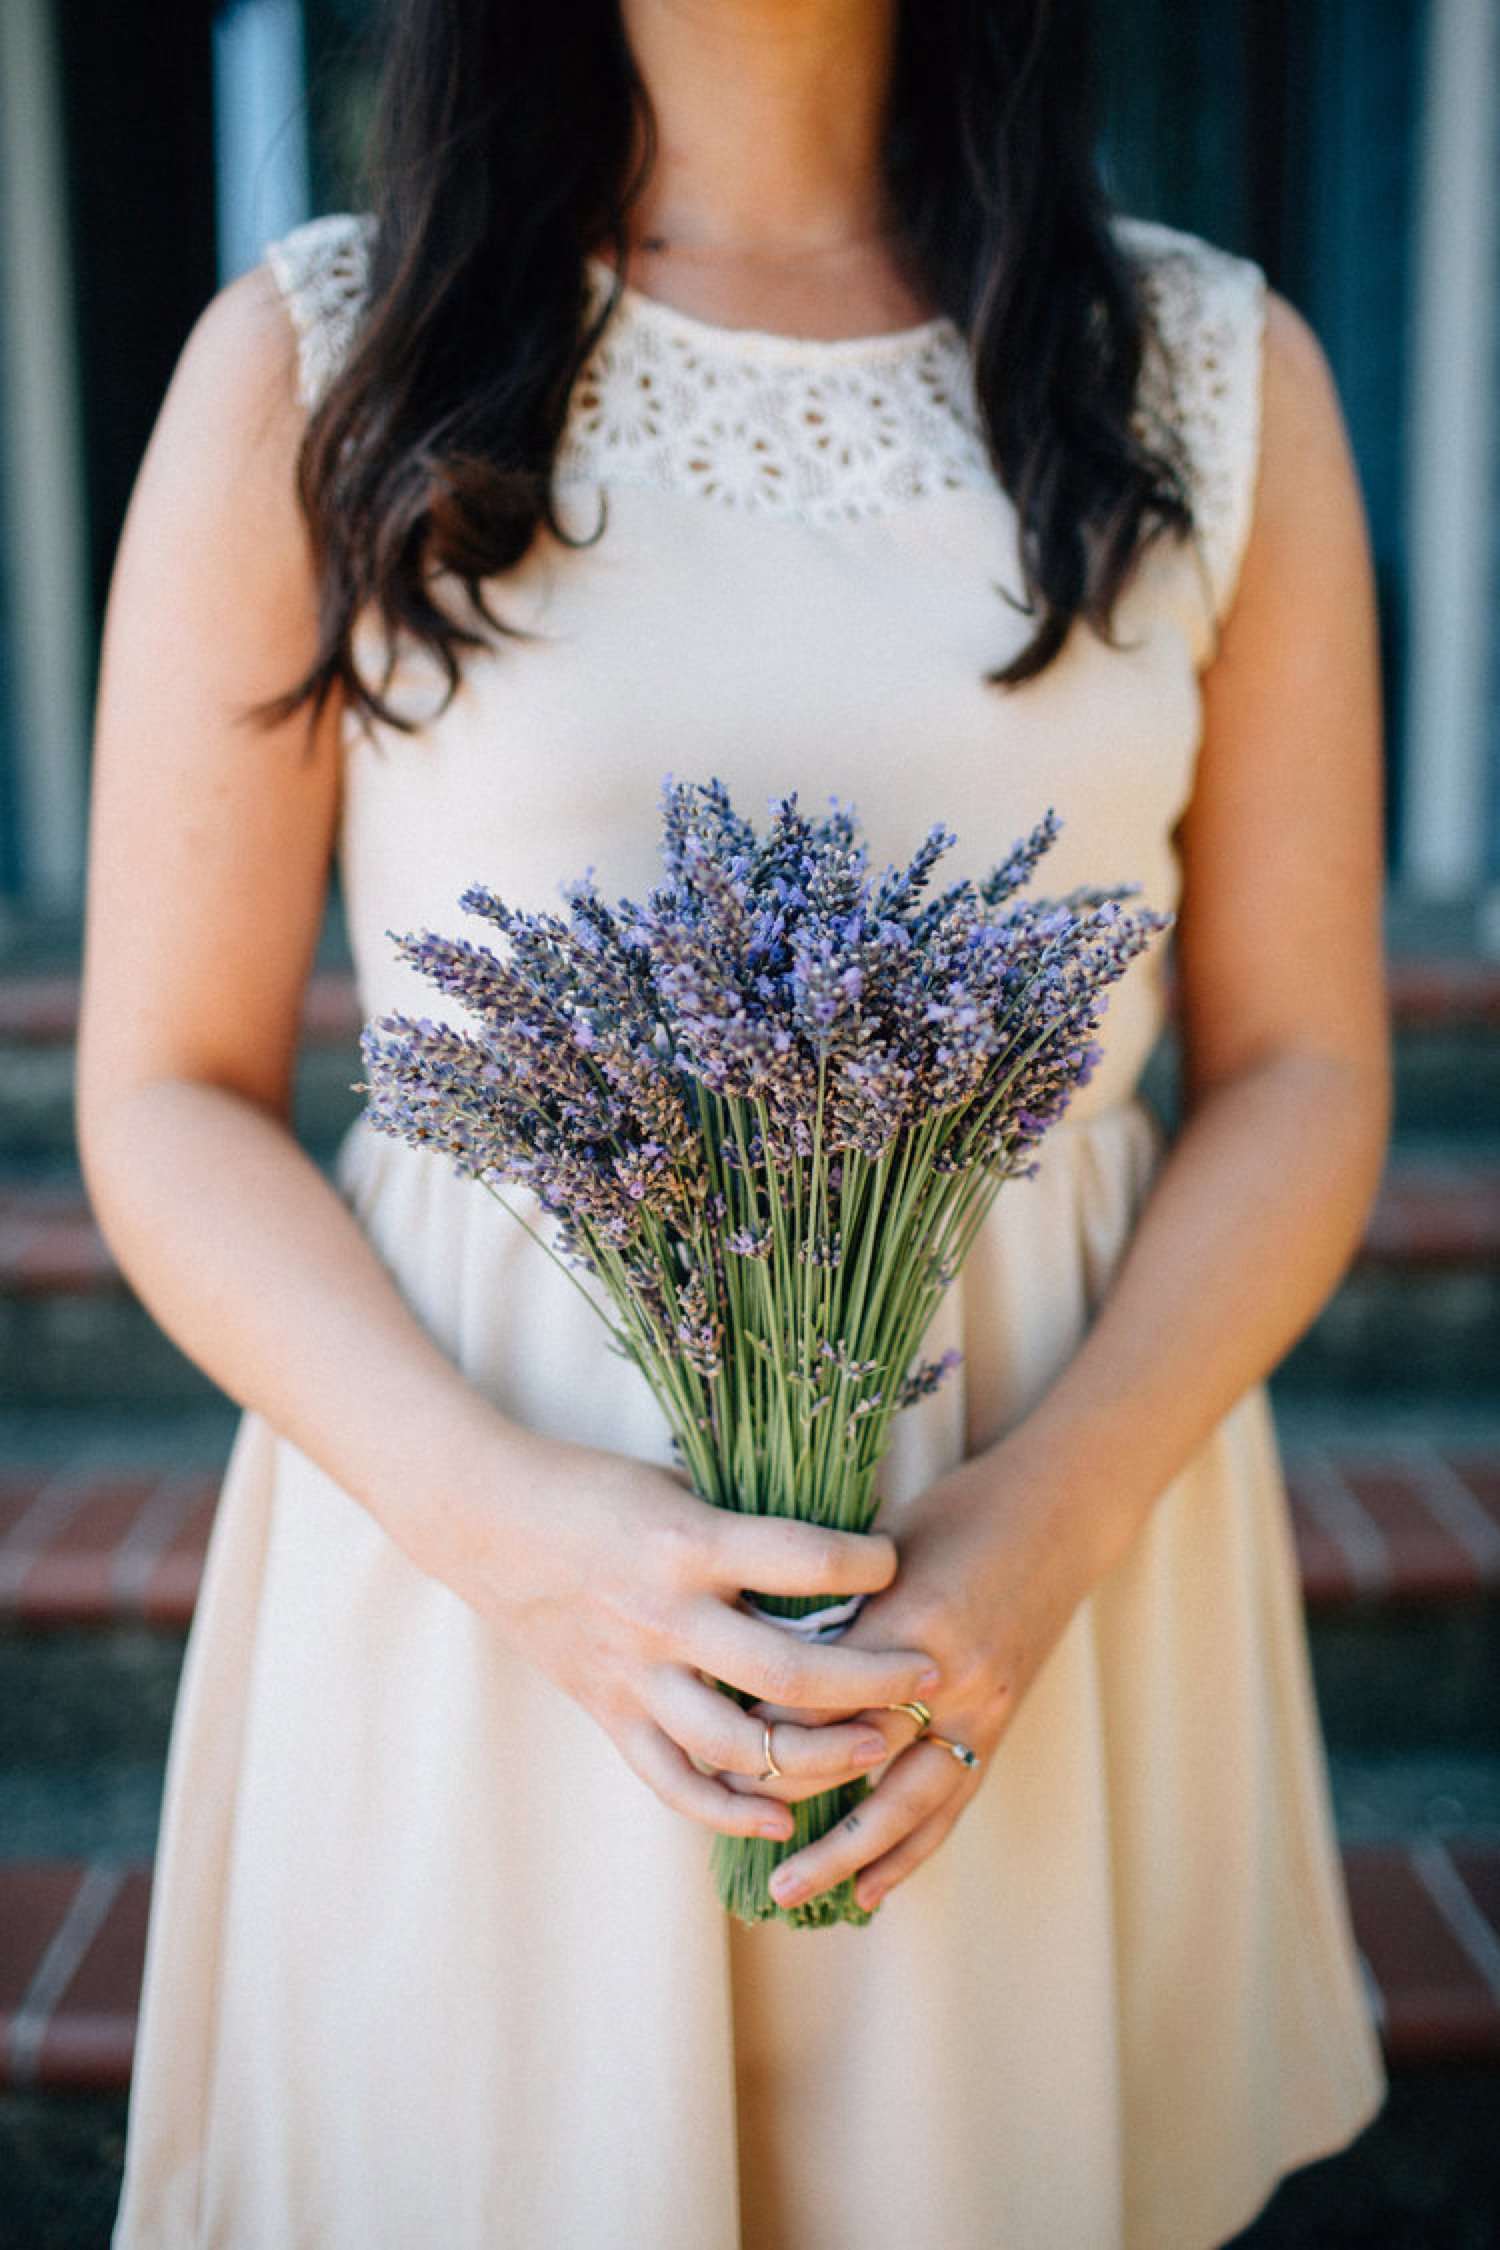 Bride holding a rustic bouquet of lavender.